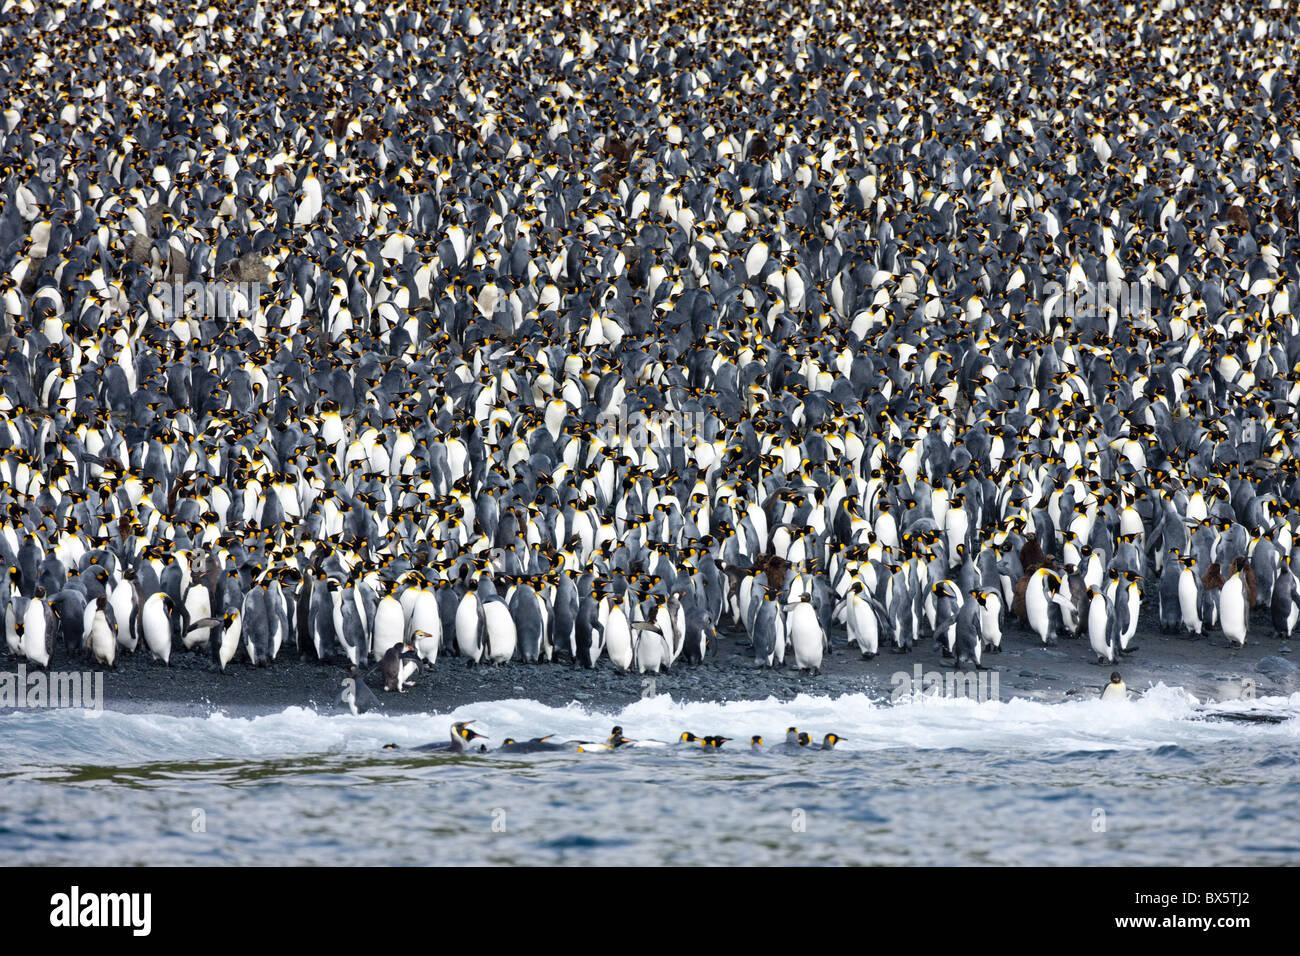 King penguin colony (Aptenodytes patagonicus), Macquarie Island, Sub-Antarctic, Polar Regions - Stock Image